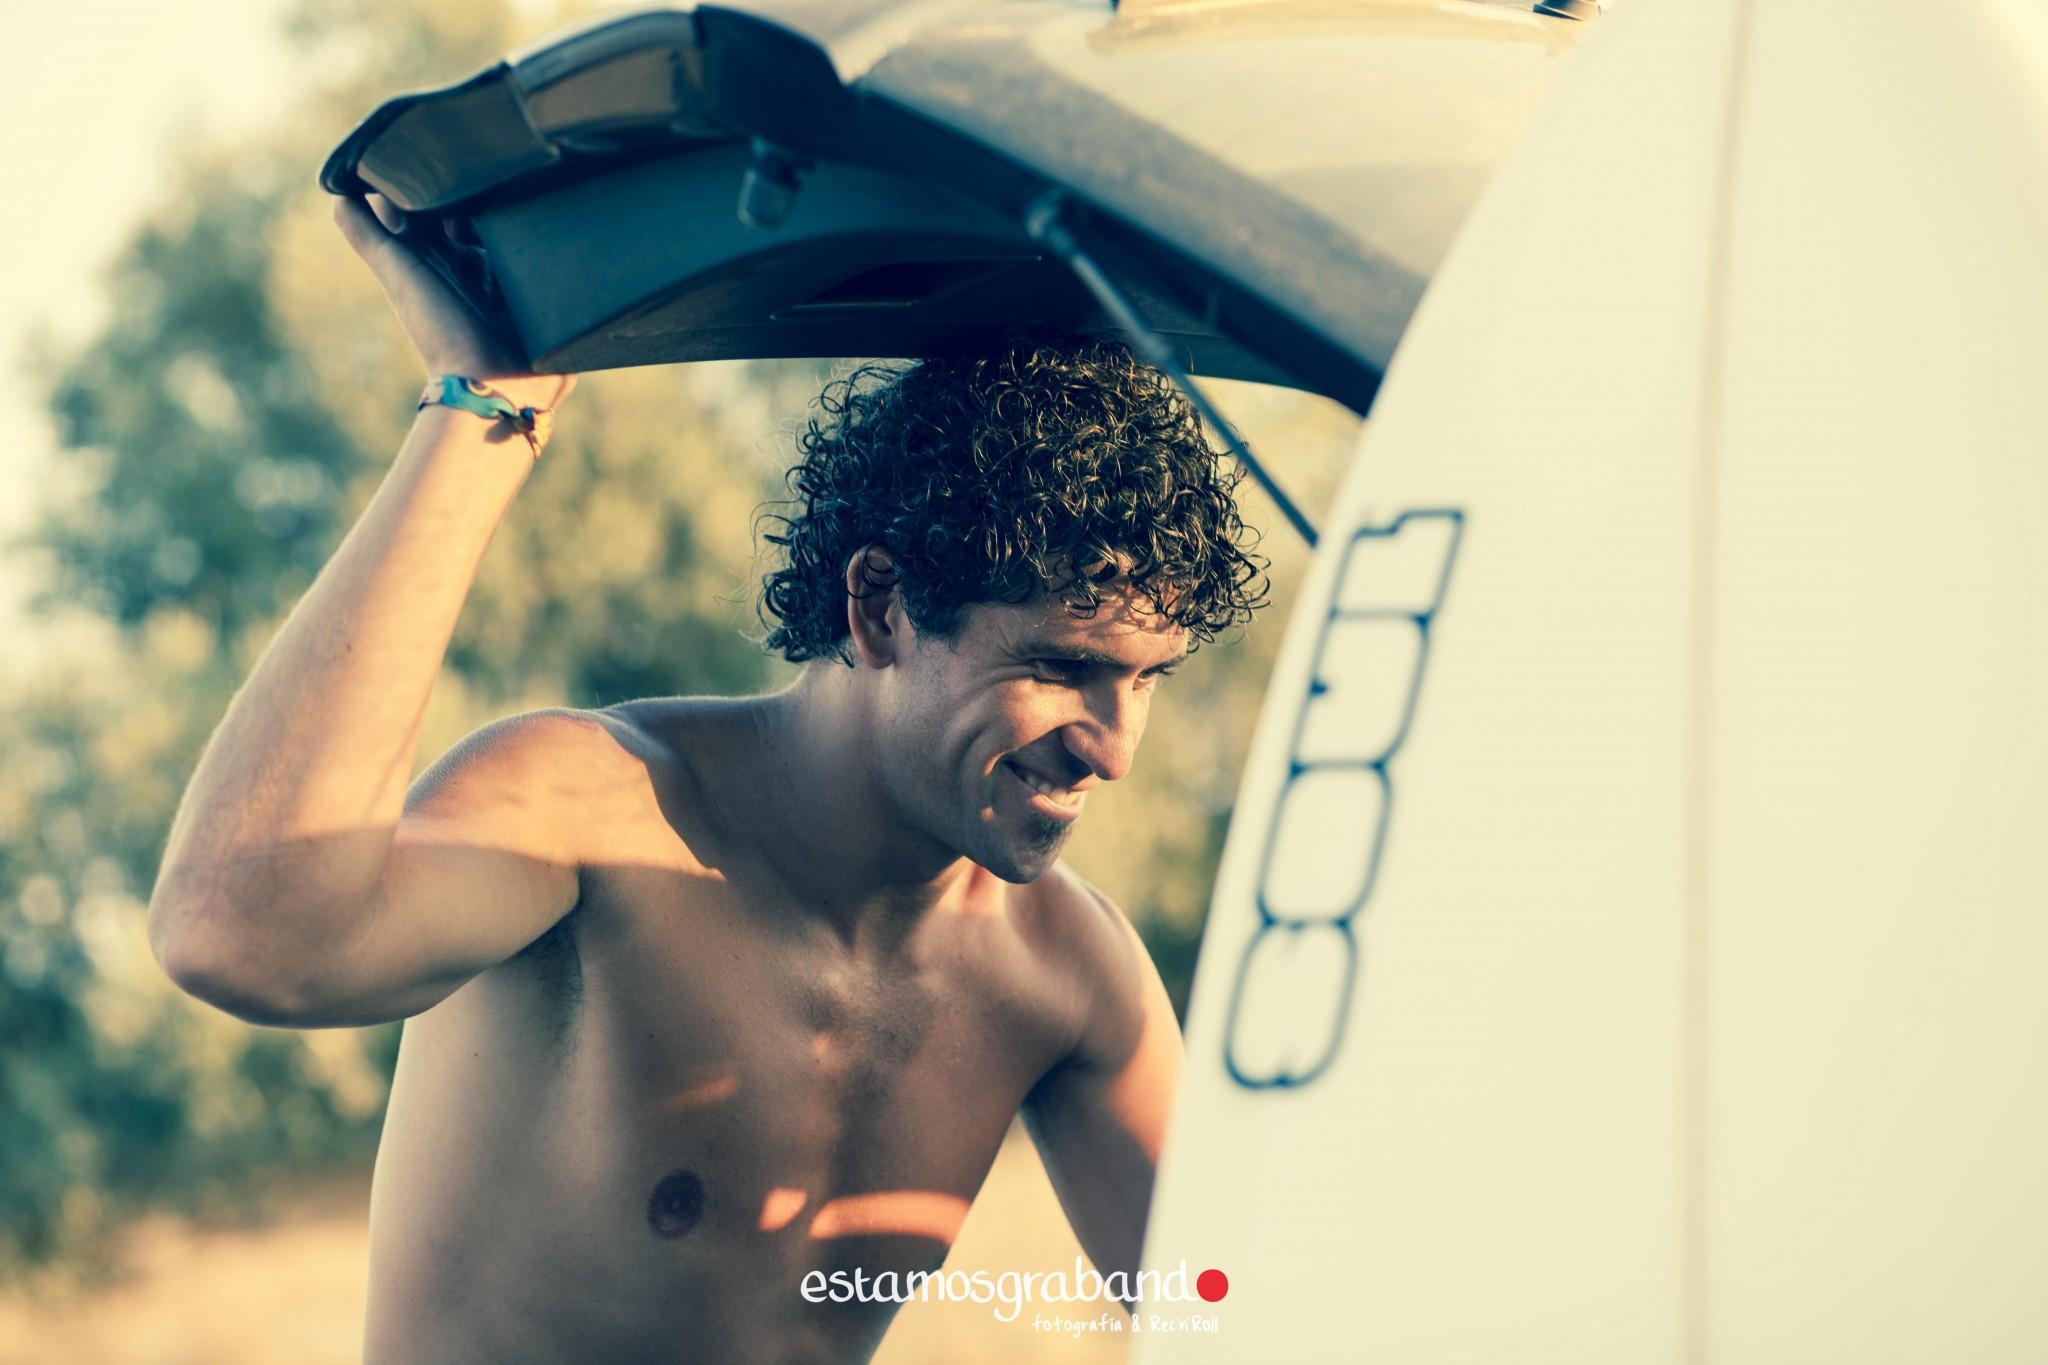 miriam-y-jesucc81s_preboda-blog-14 Surf & Love [Preboda Recandrolera_Miriam & Jesús] - video boda cadiz